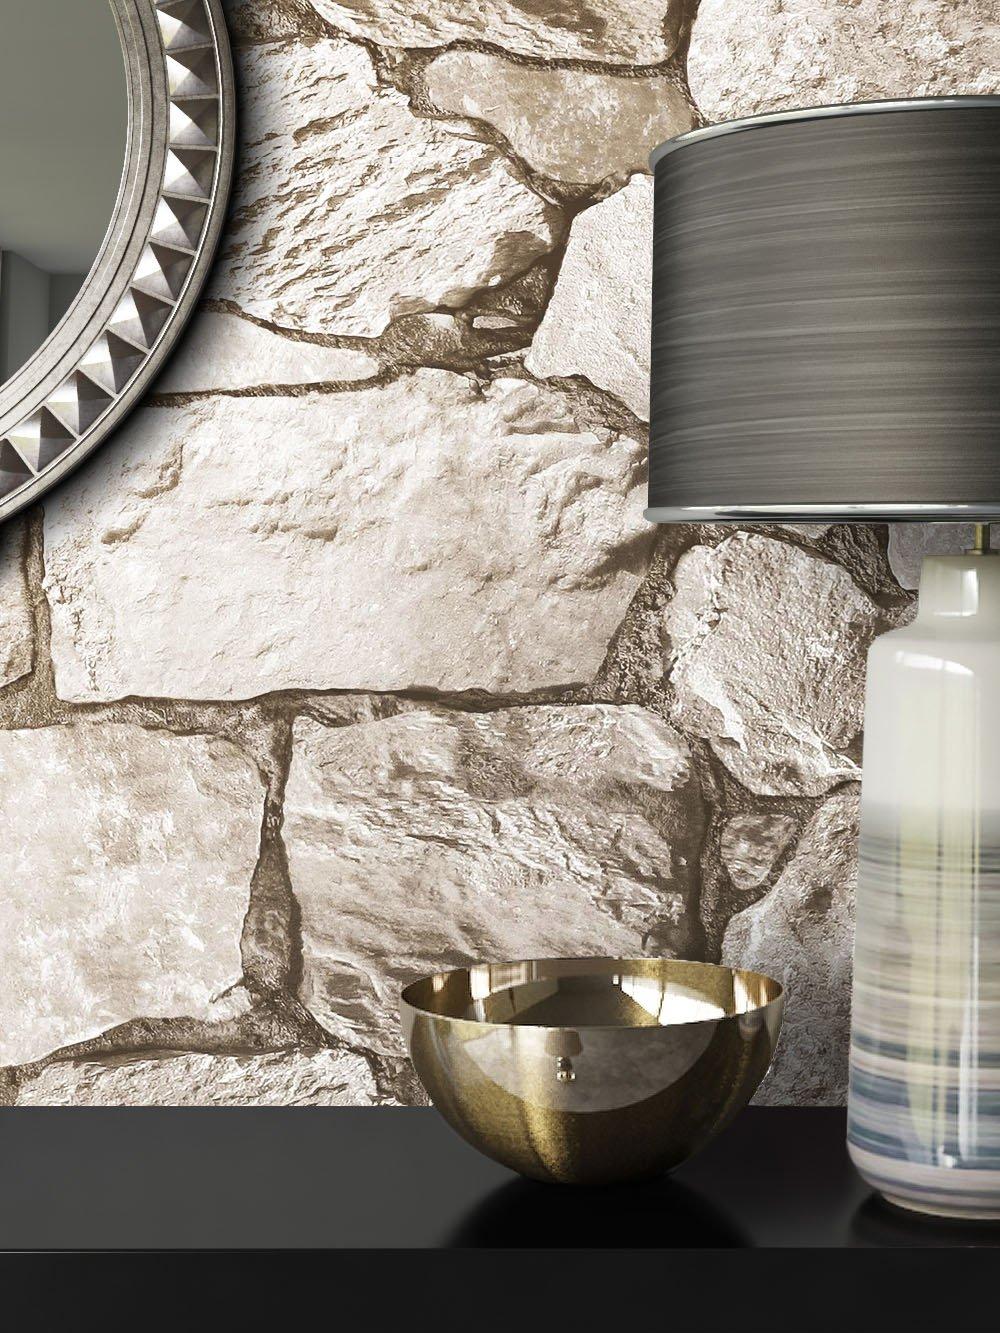 inclusivi Guida alla tappezzeria NEWROOM pietra carta da parati crema fliselina crema Landhaus Modern Mauer Stein bella ottica 3D moderna e nobile design moderno e nobile ottica 3D